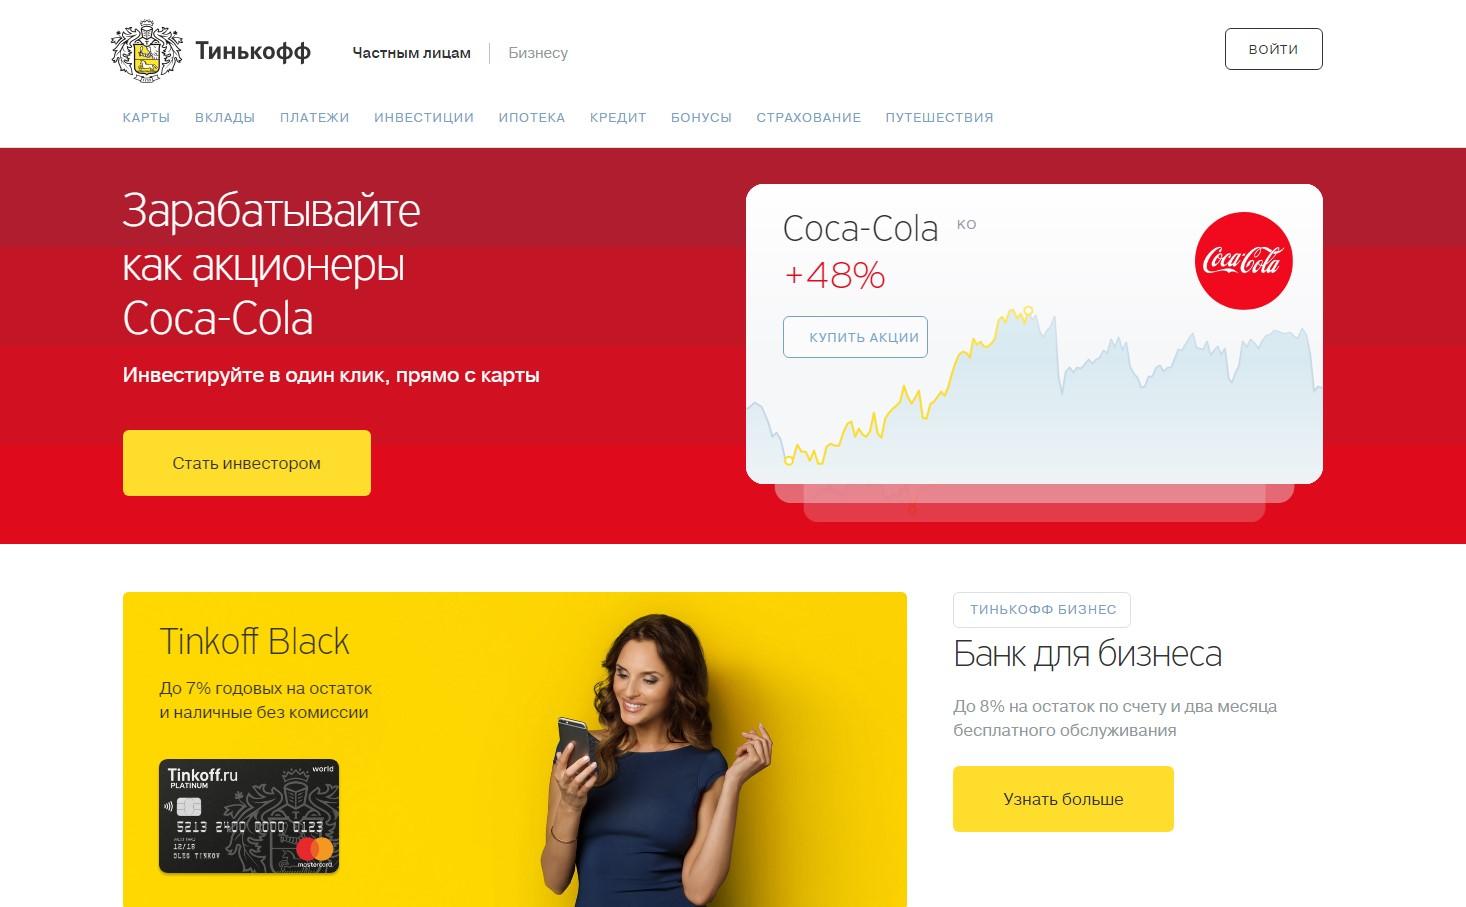 Веб-страница сайта